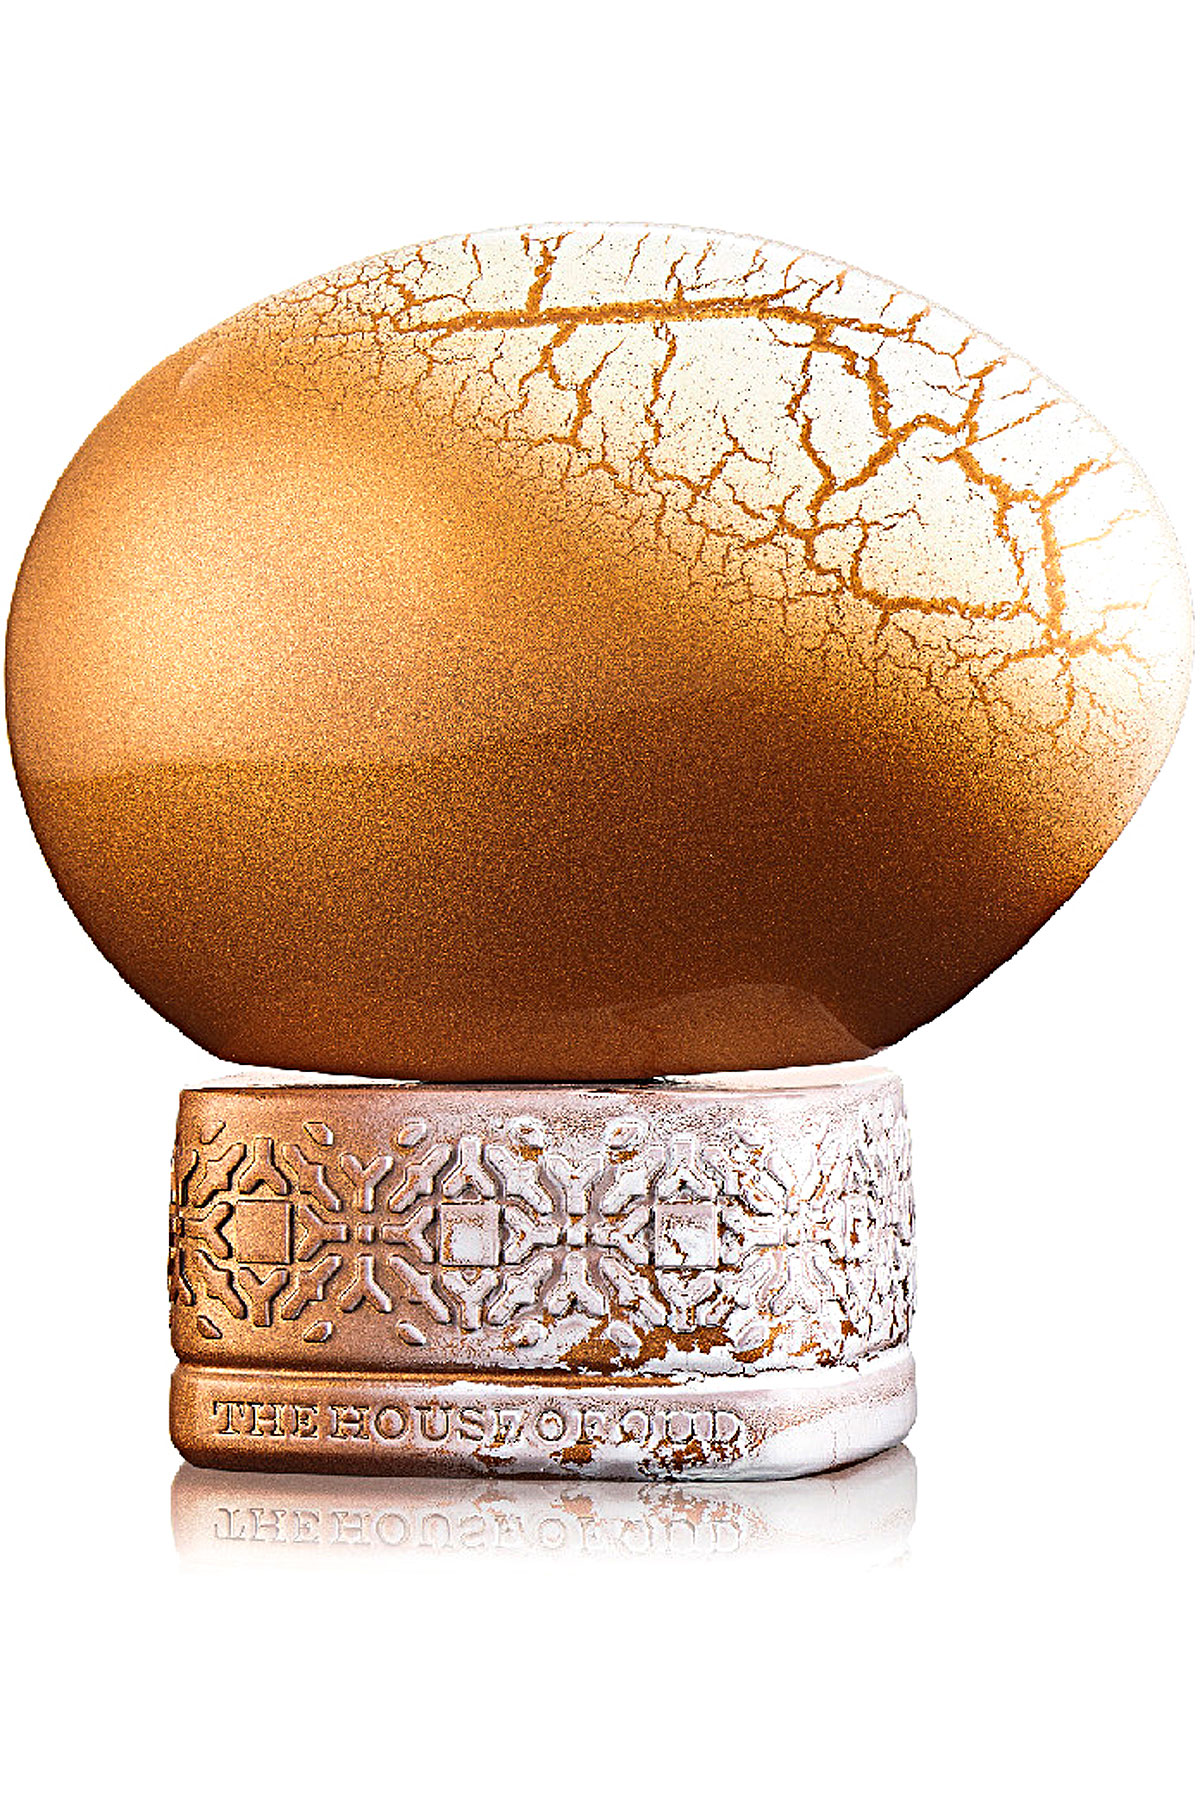 The House Of Oud Fragrances for Men, Desert Day Collection - Wonderly - Eau De Parfum - 75 Ml, 2019, 75 ml